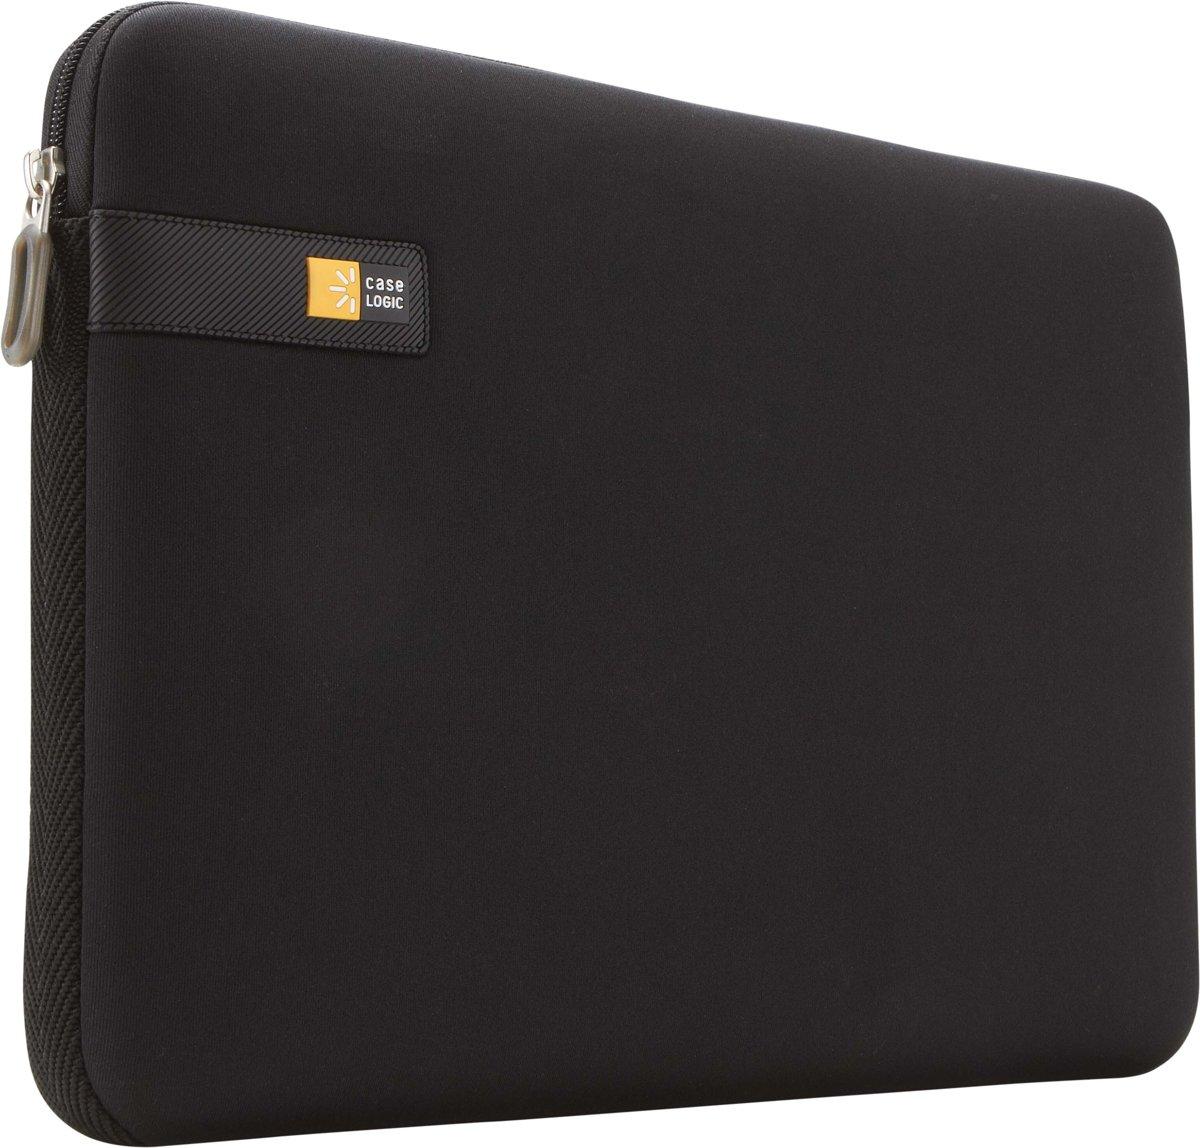 0a3ccd4846a bol.com | Case Logic LAPS116 - Laptop Sleeve - 15.6 inch / Zwart